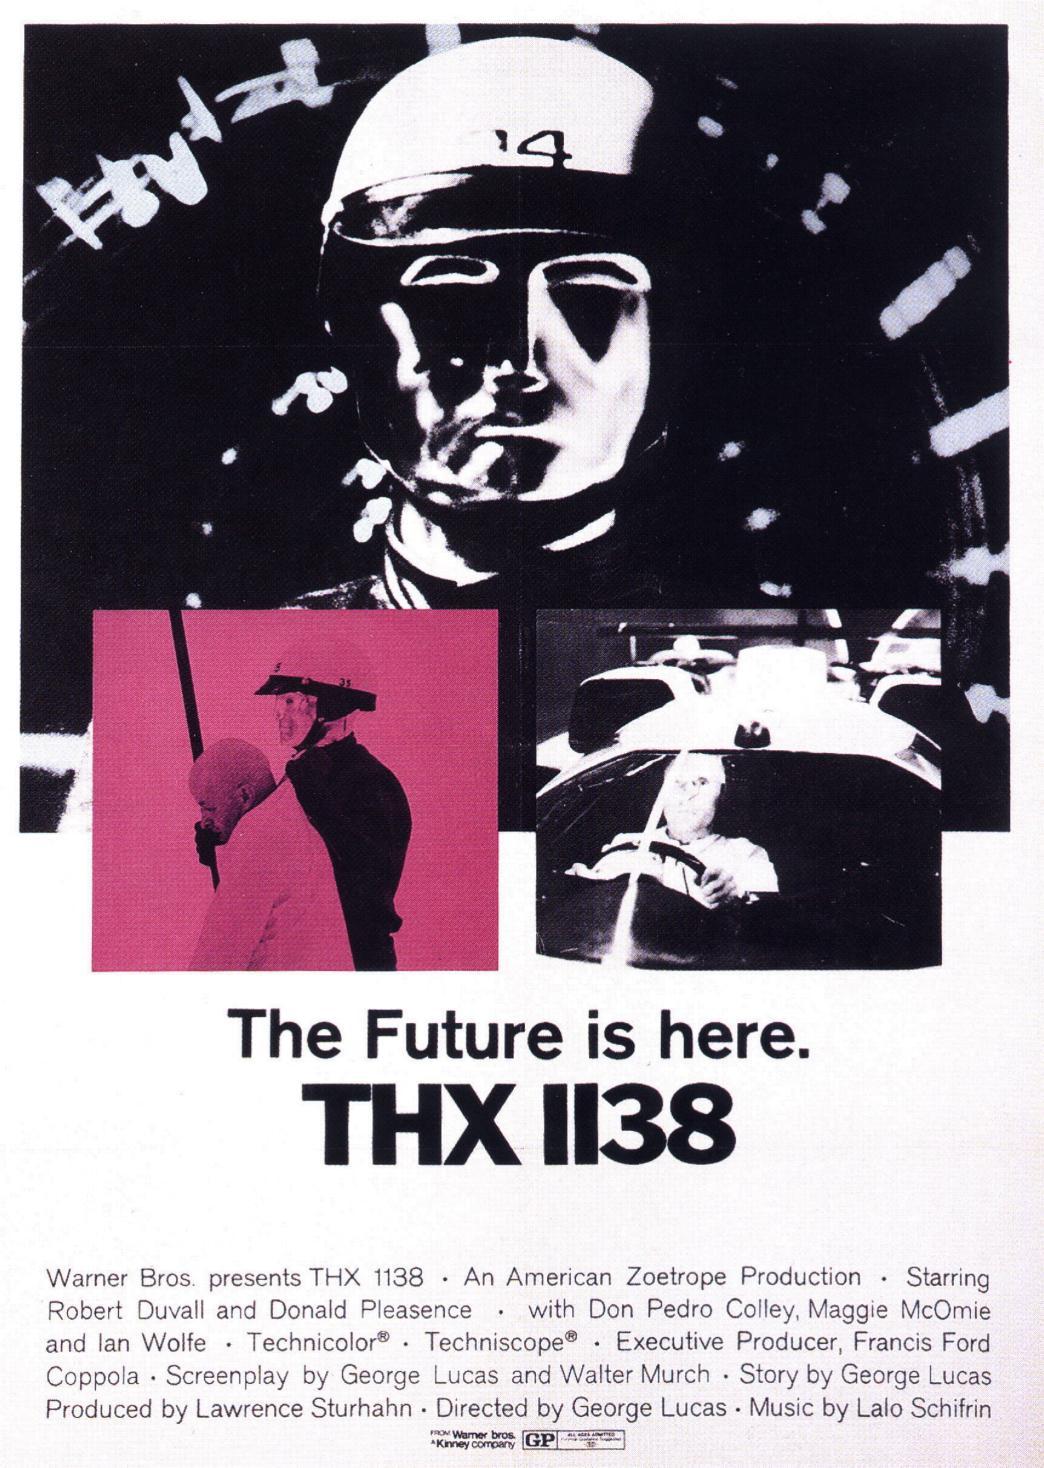 THX 1138 - 디스토피아의 정수가 온몸에 스미게 하는..